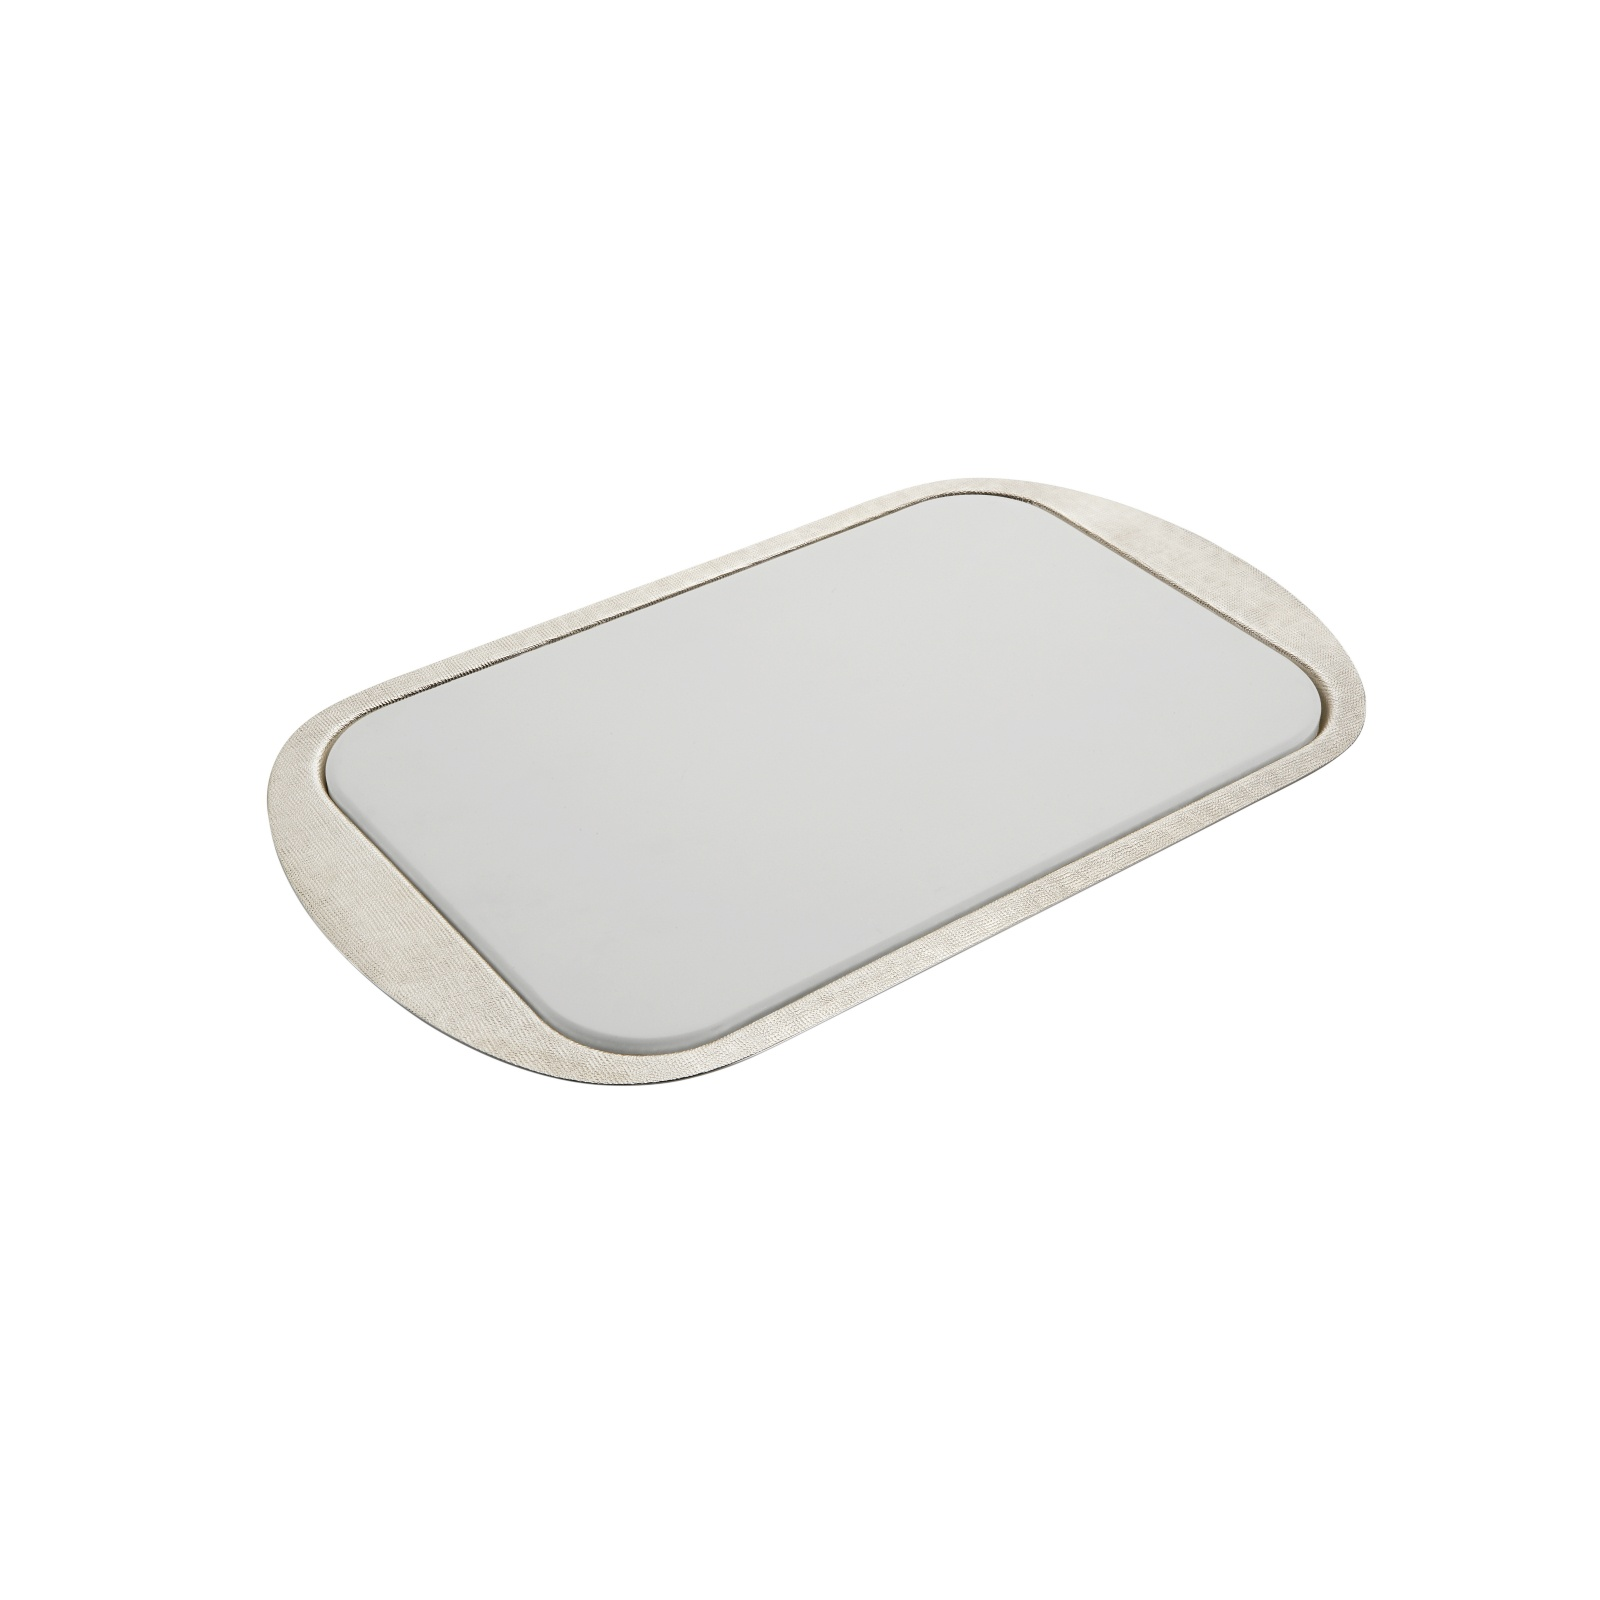 vassoio-tavola-corian-lega-argento-zanetto